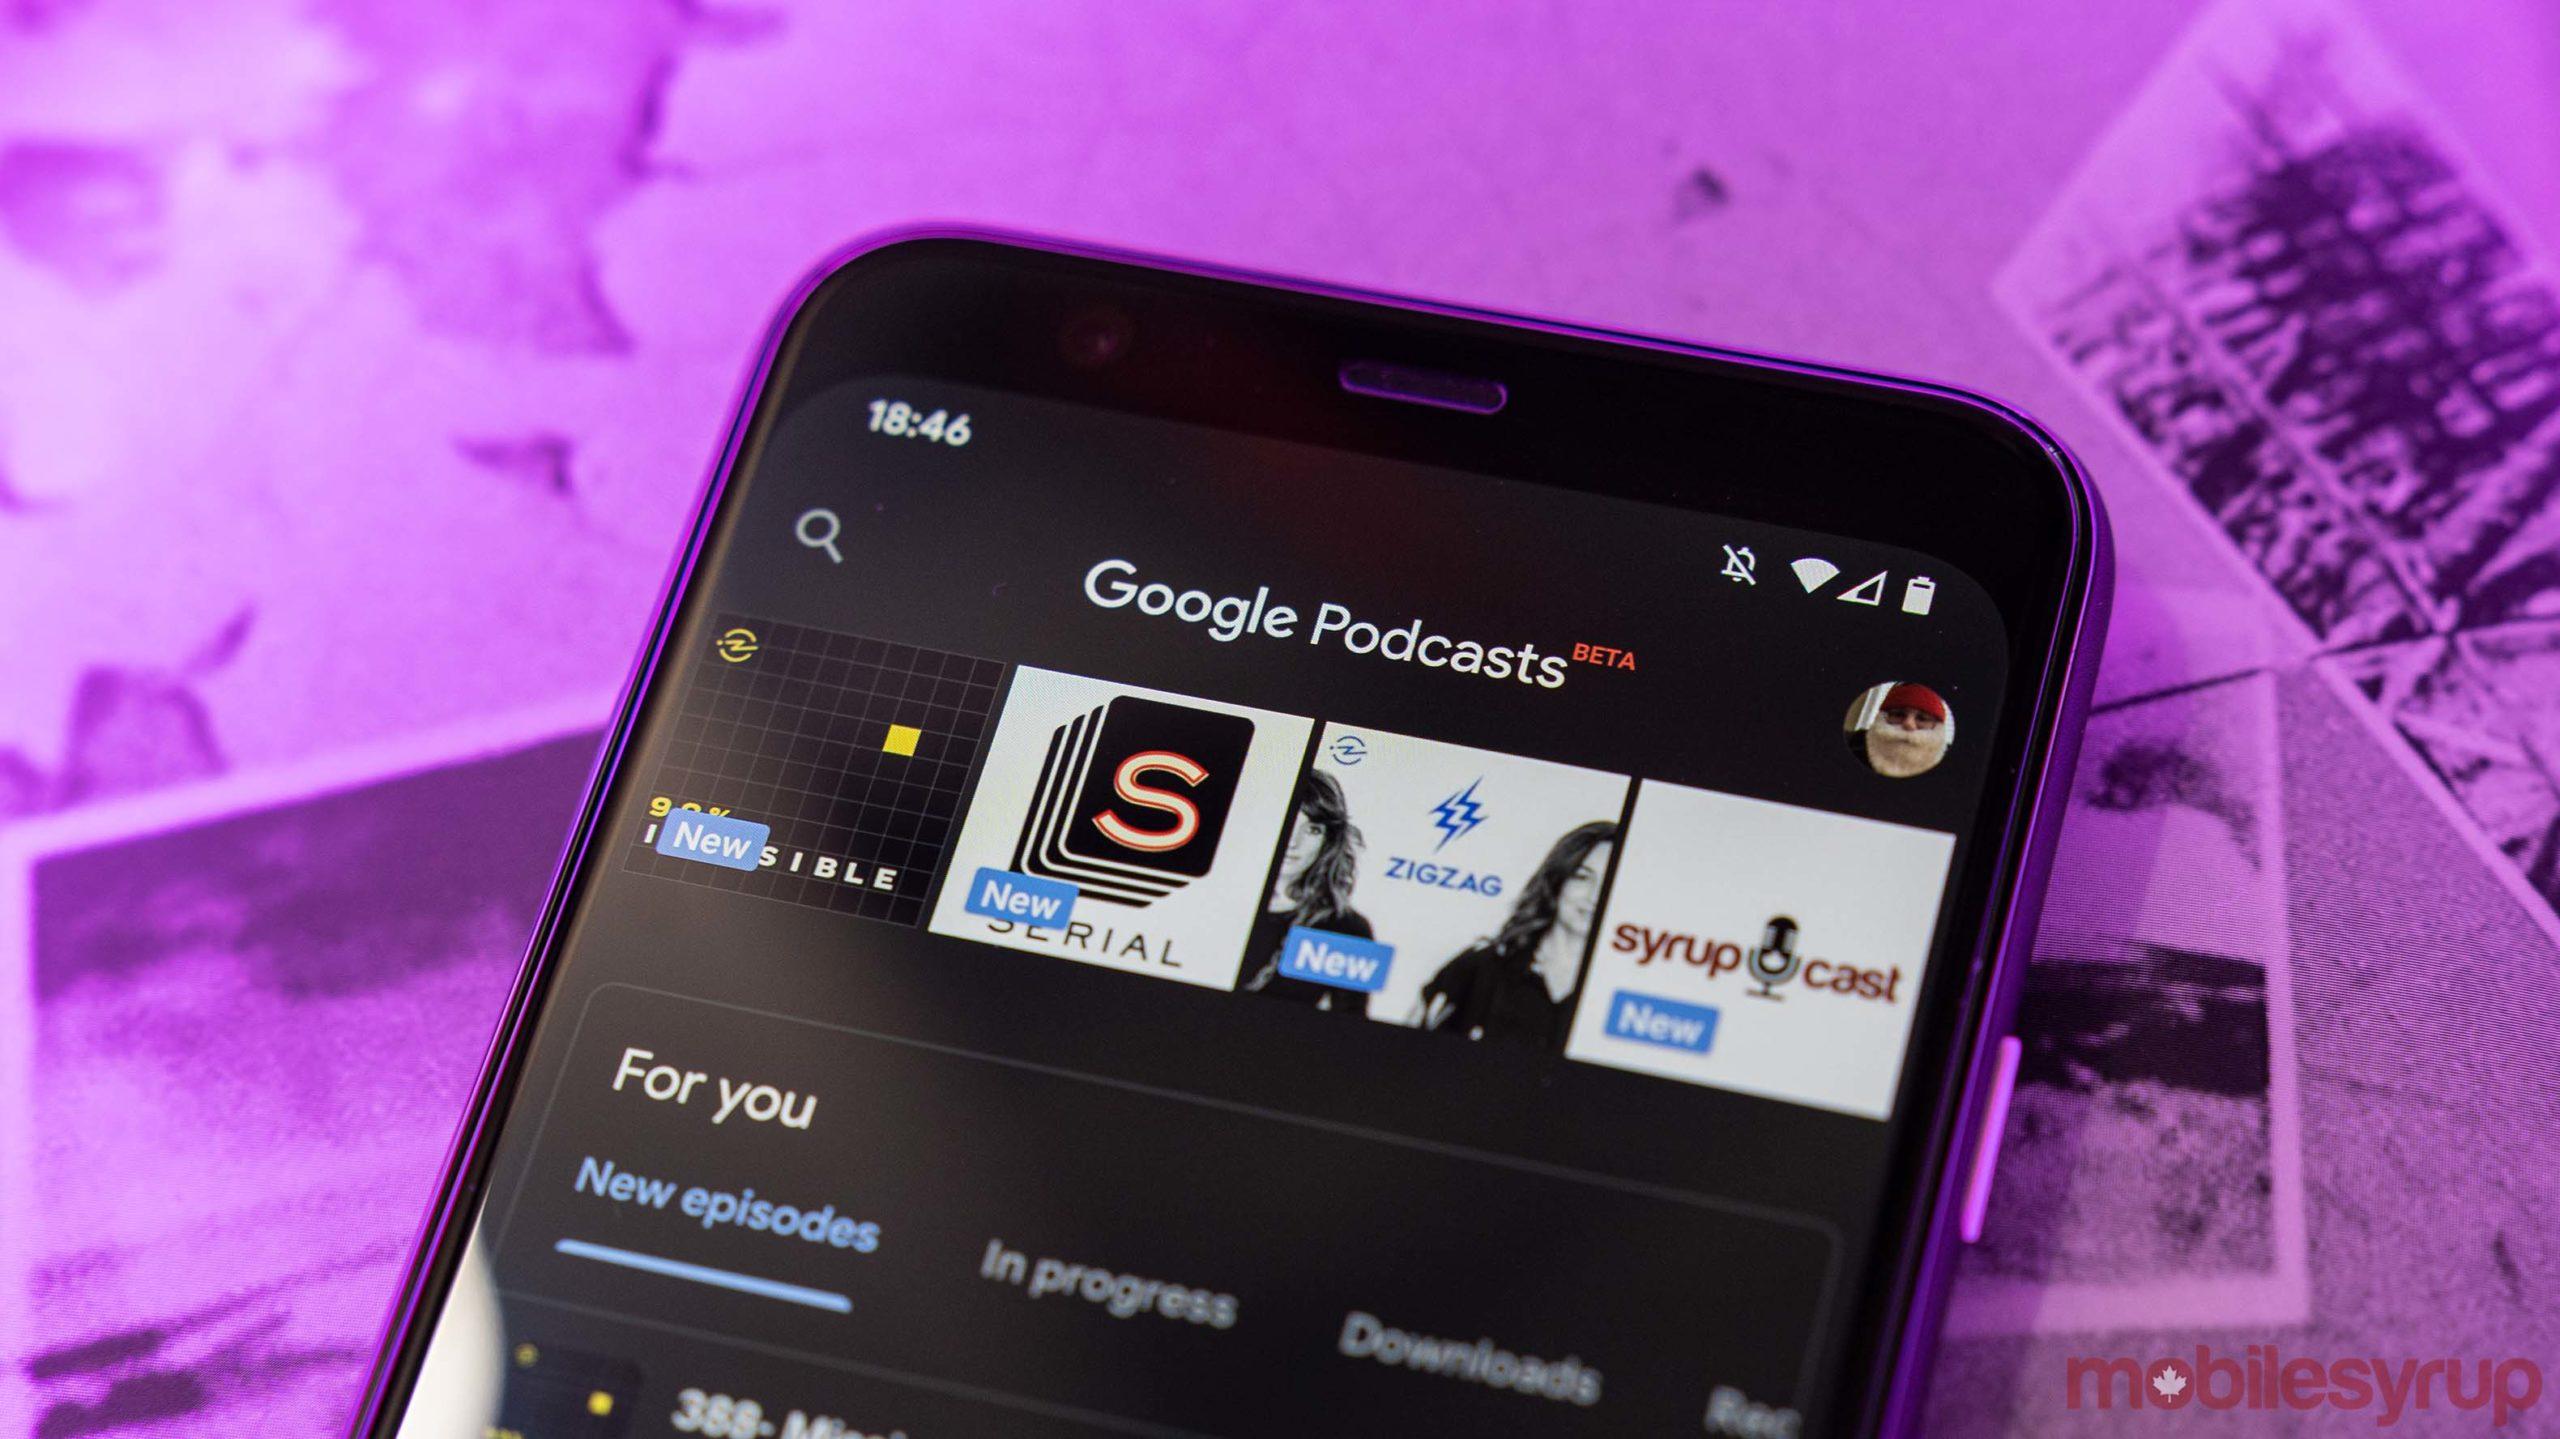 Google Podcasts dark mode